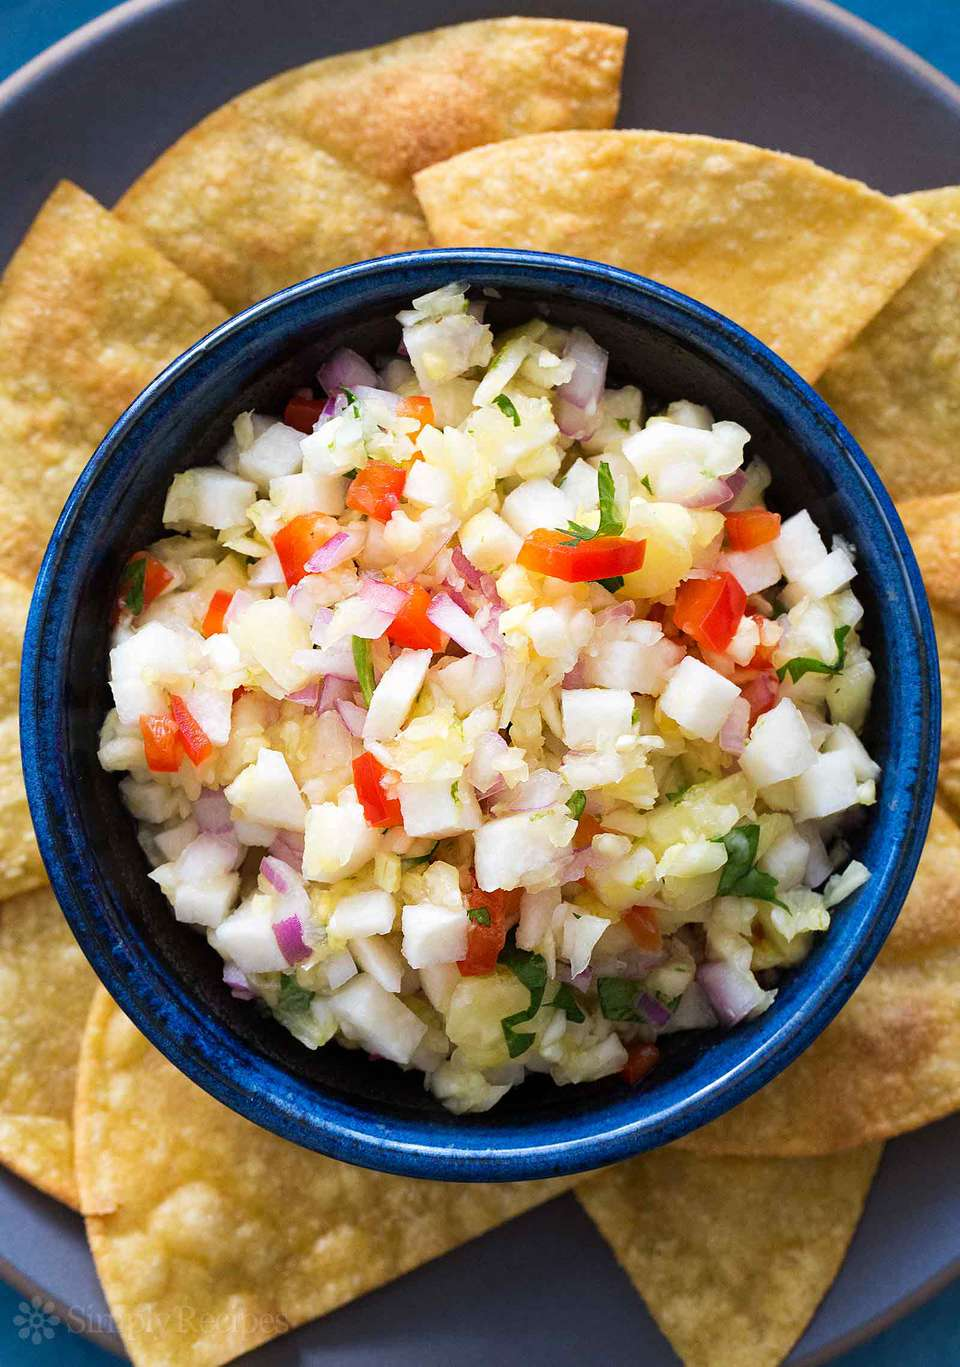 Pineapple Salsa with Jicama